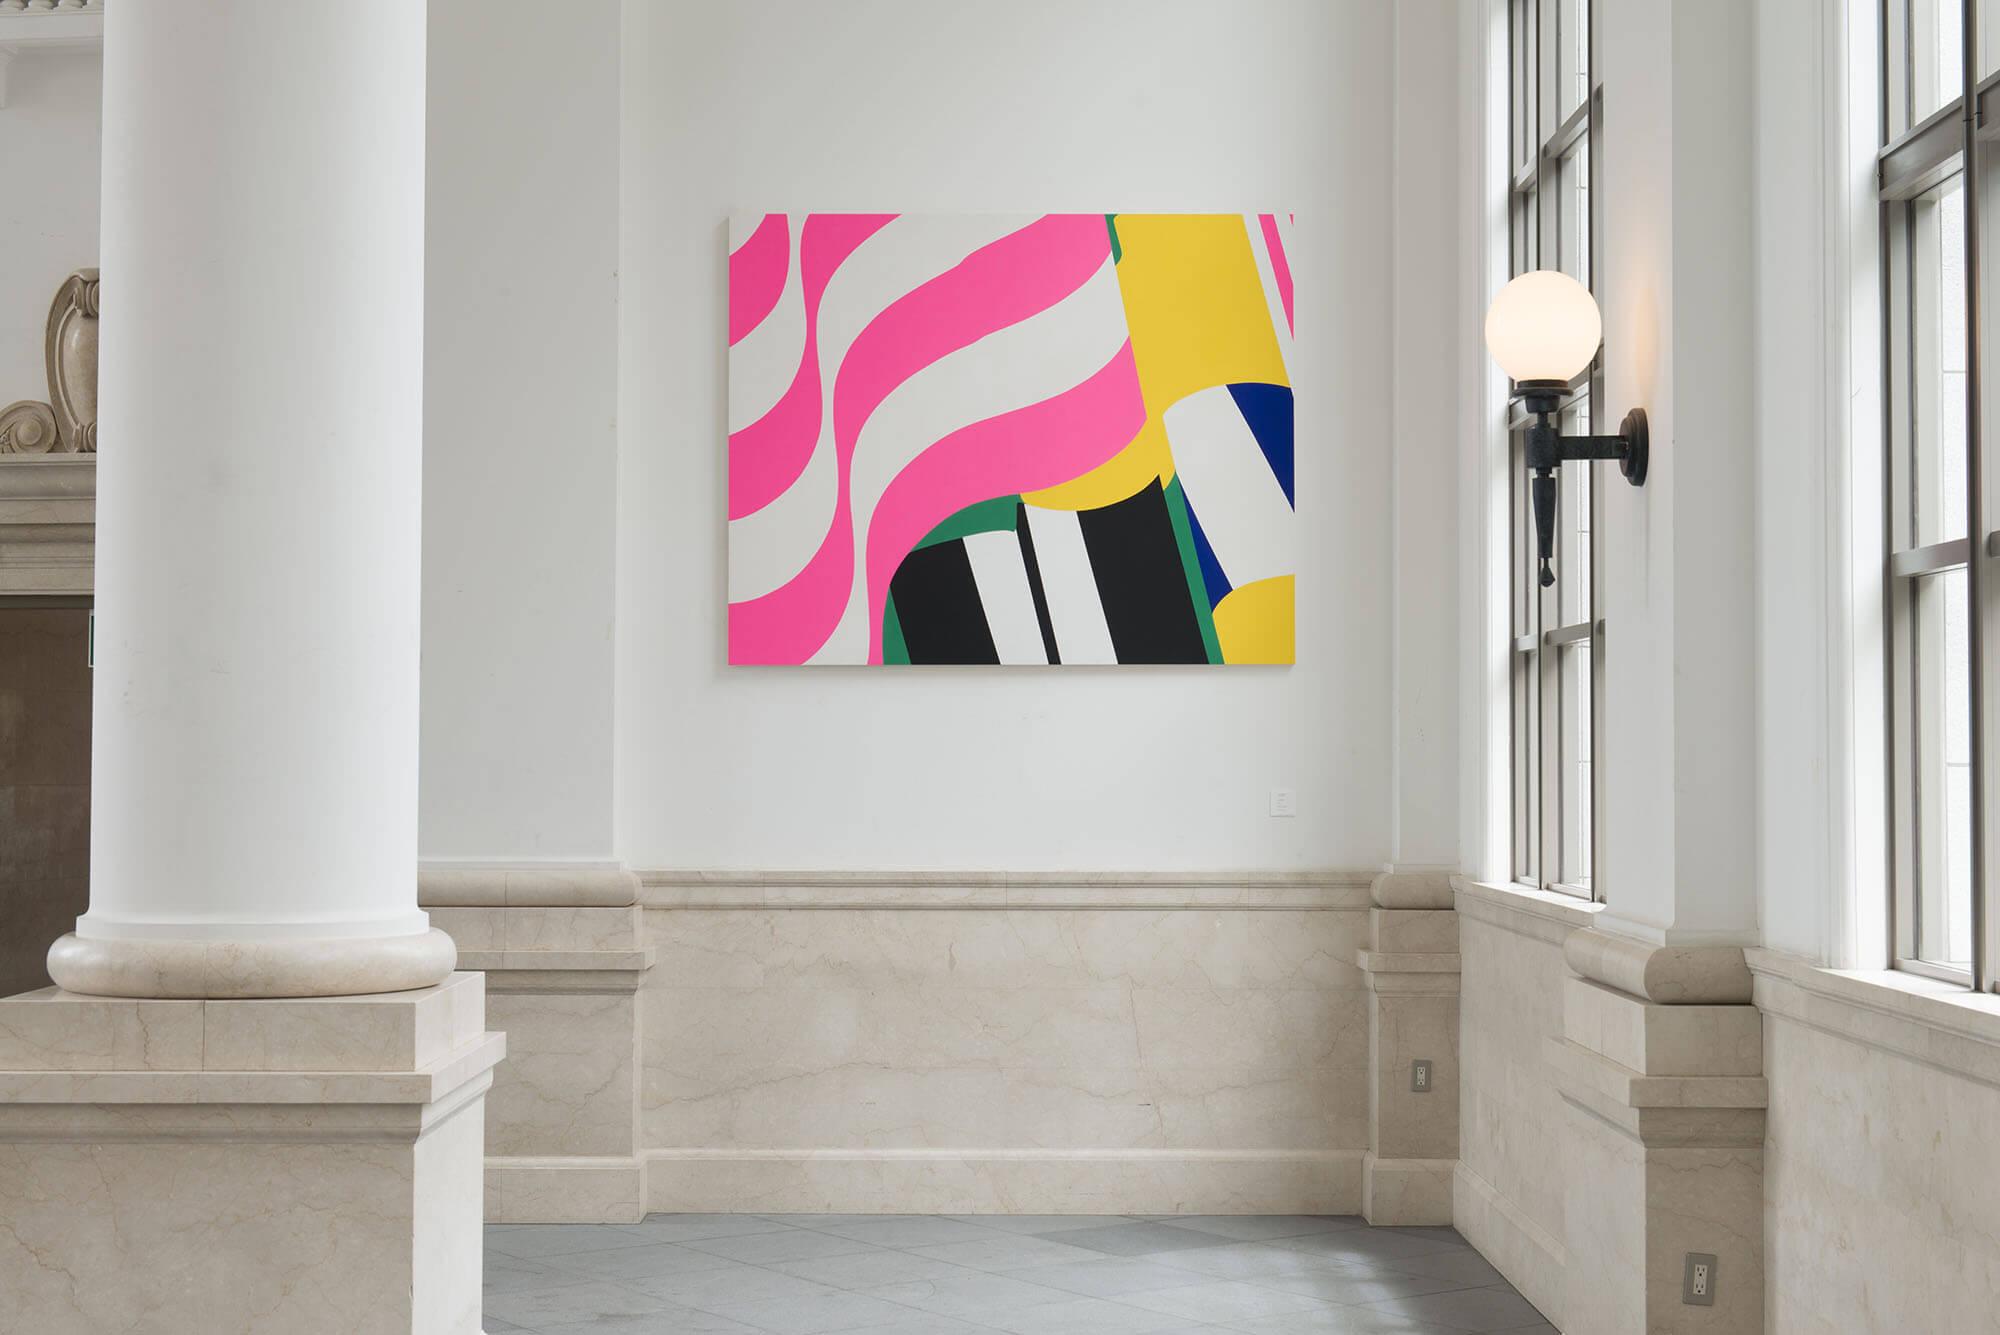 YCC展示プログラム 今井俊介|offsociety inc. YCC Exhibition Program | Shunsuke Imai 現代美術・アート Contemporary Art